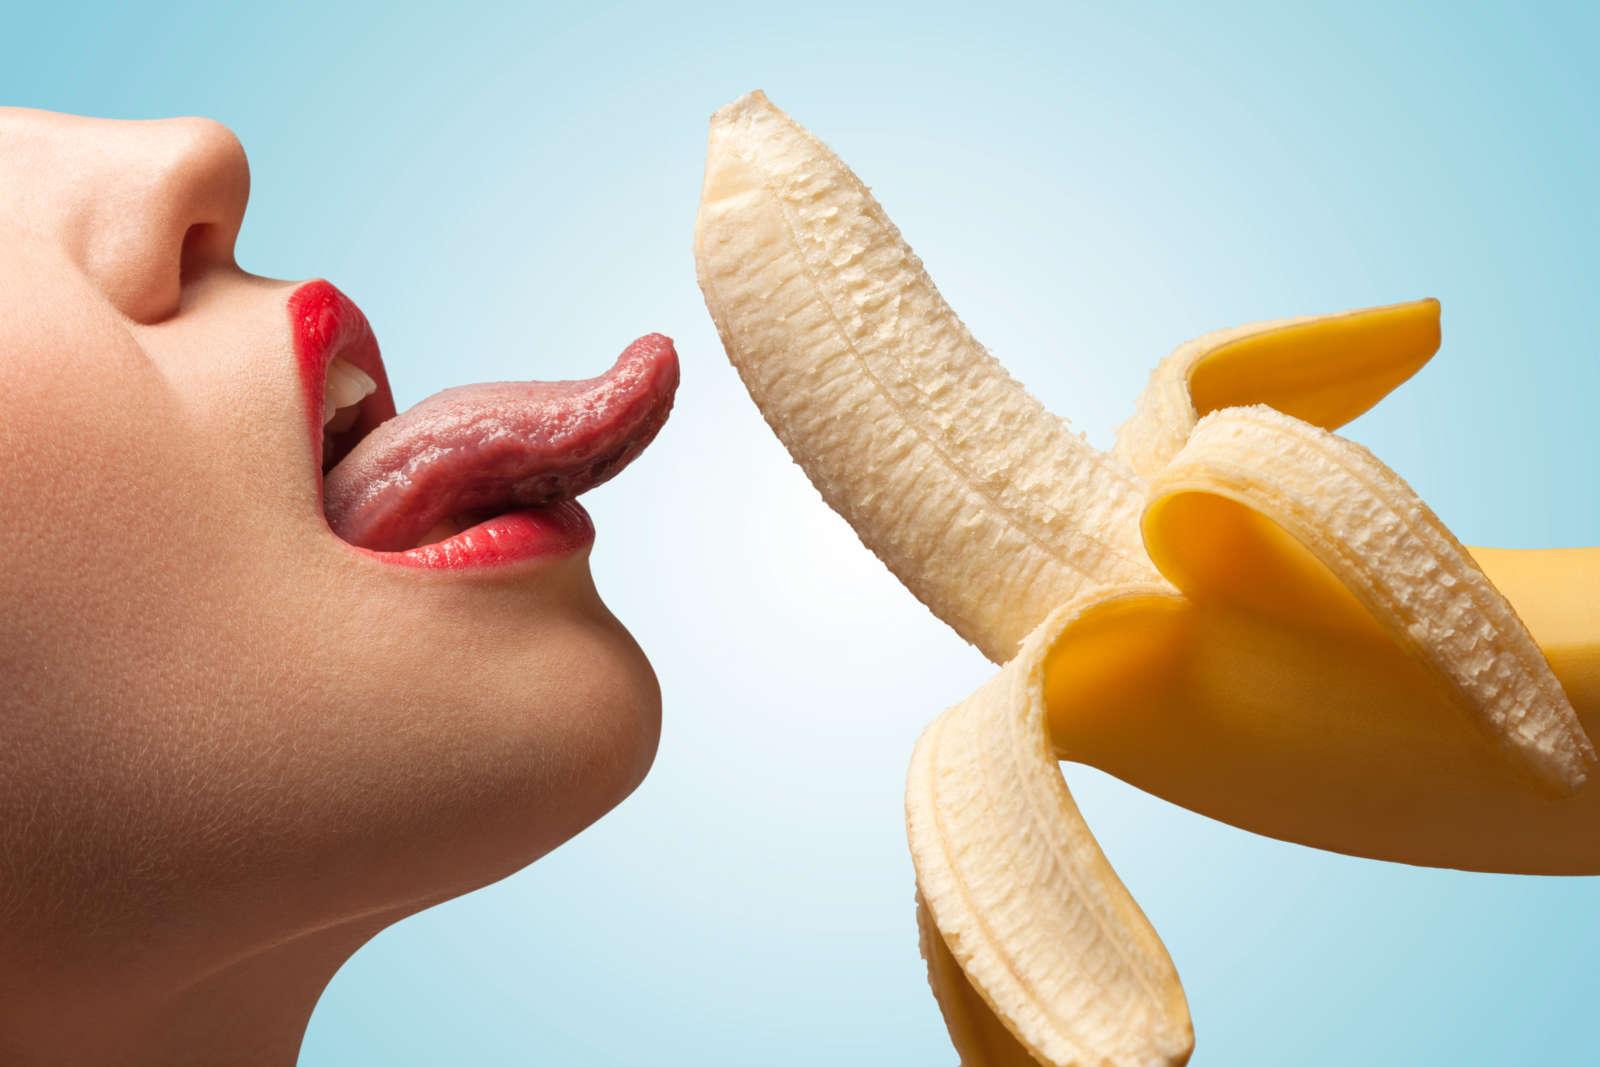 blowjob banana